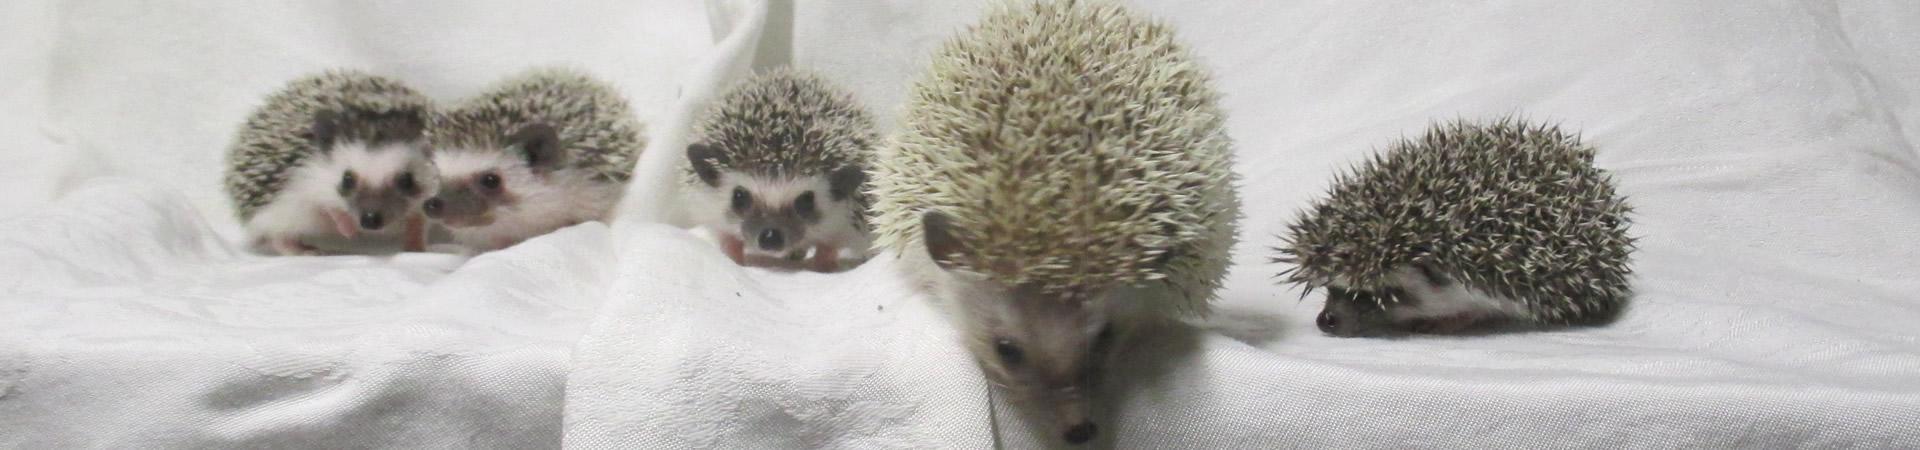 Hedgehog enthusiasts since 1994